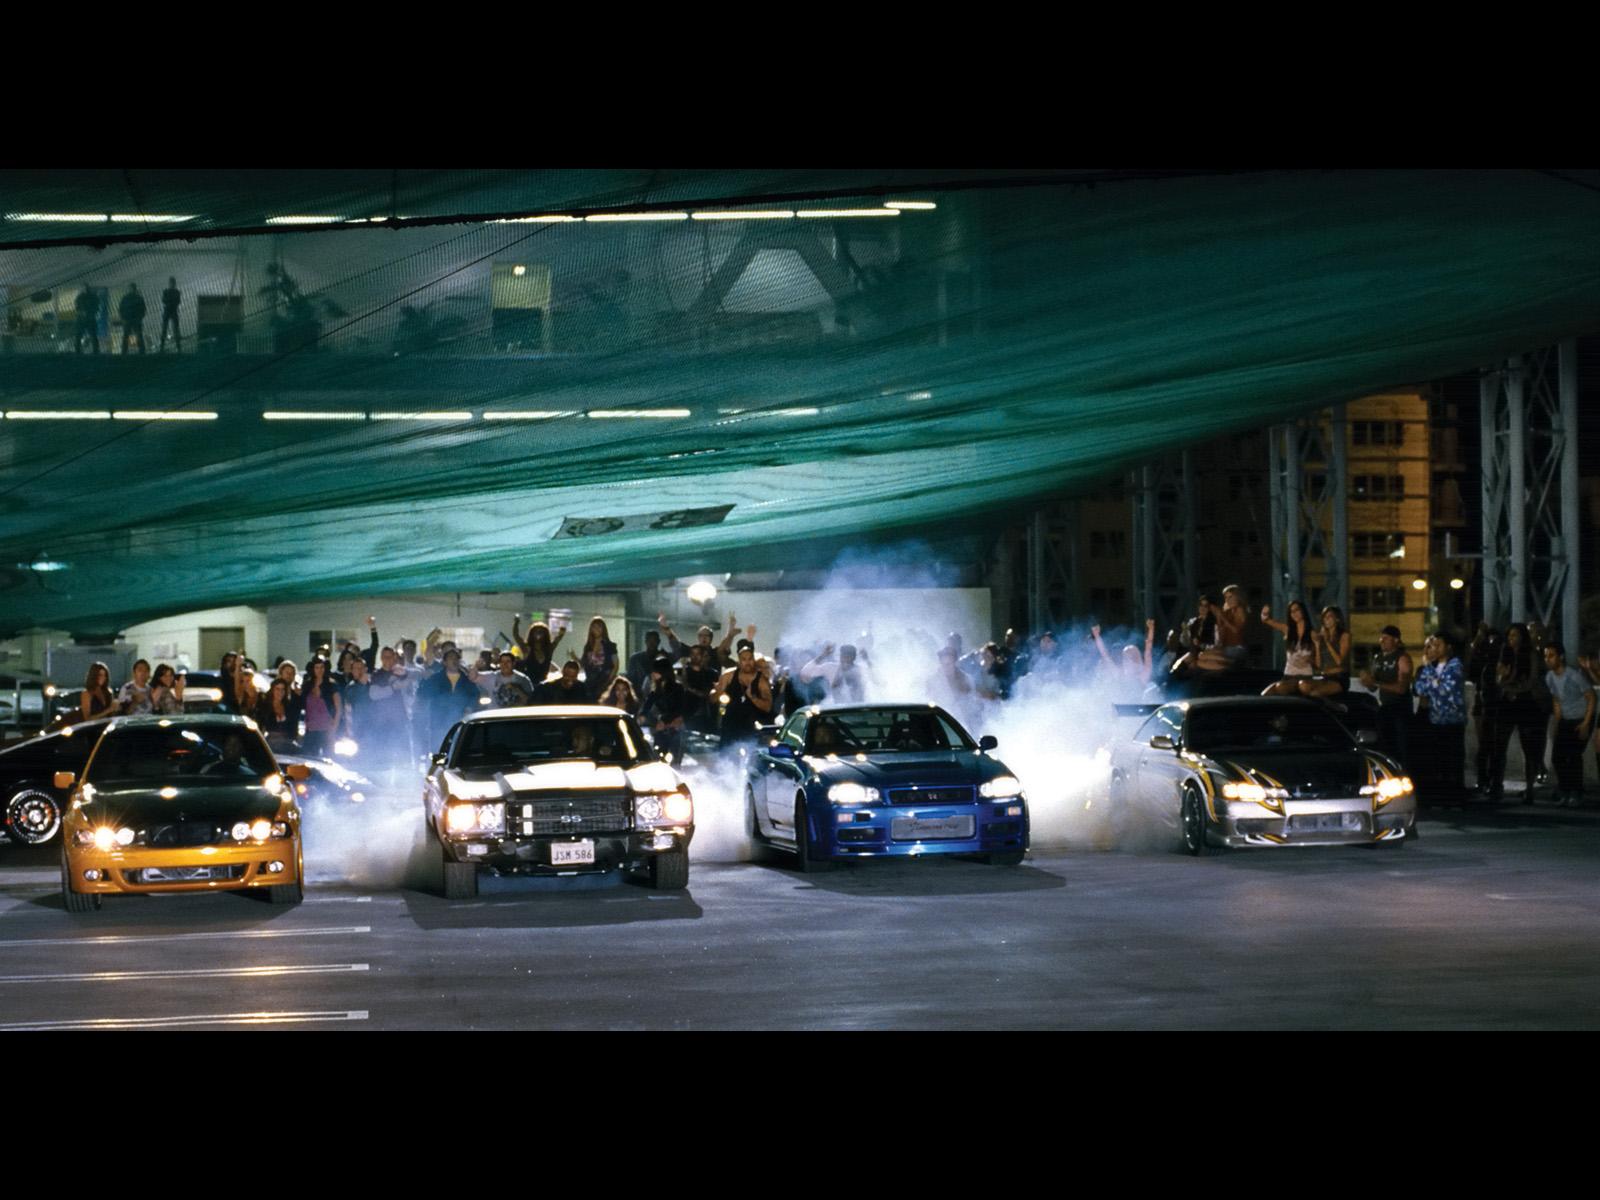 Fast And Furious Movie Cars Race 1600x1200jpg 1600x1200